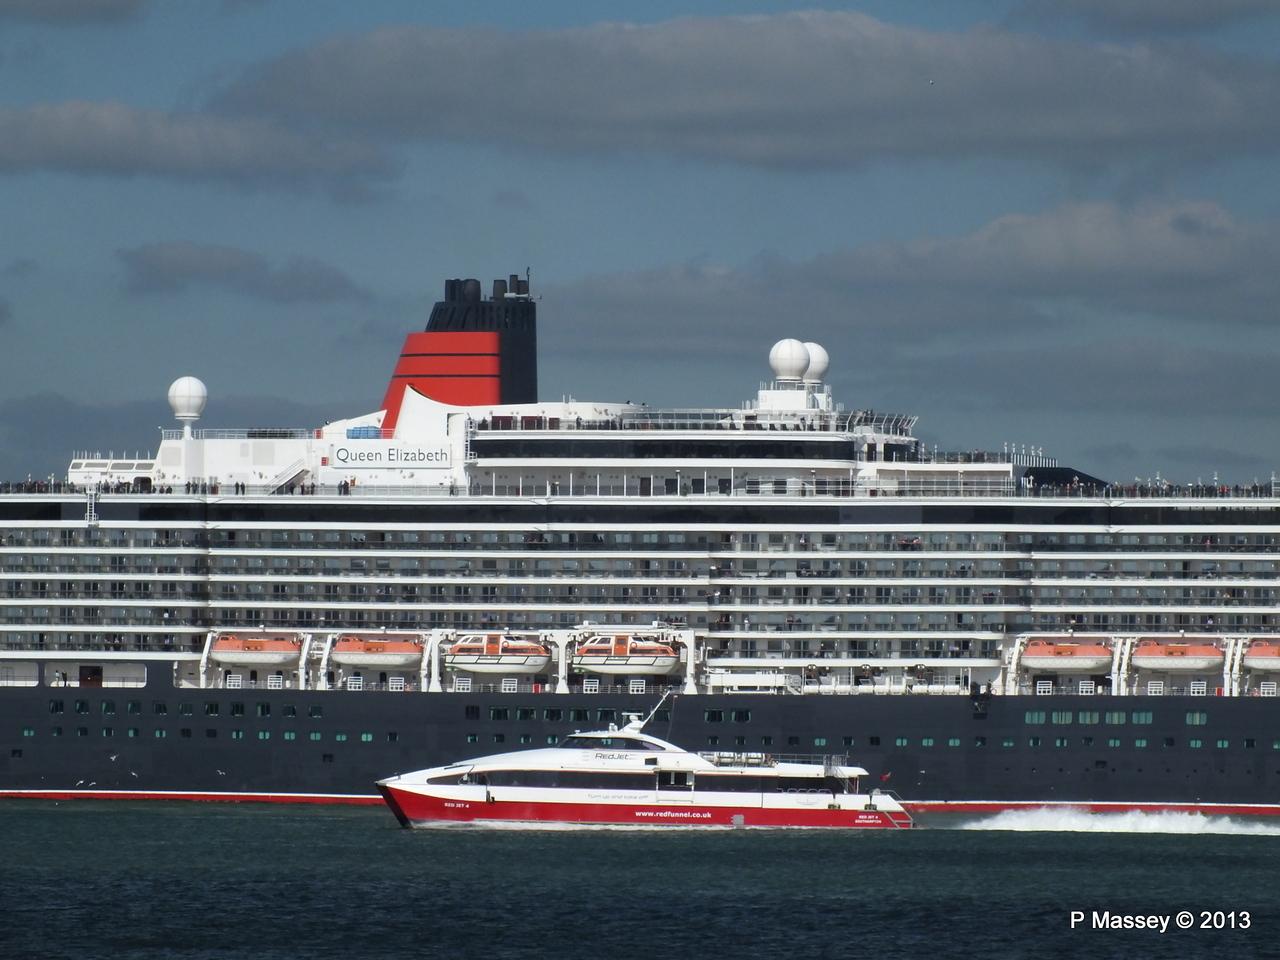 QUEEN ELIZABETH Departs Southampton PDM 09-06-2013 16-56-10